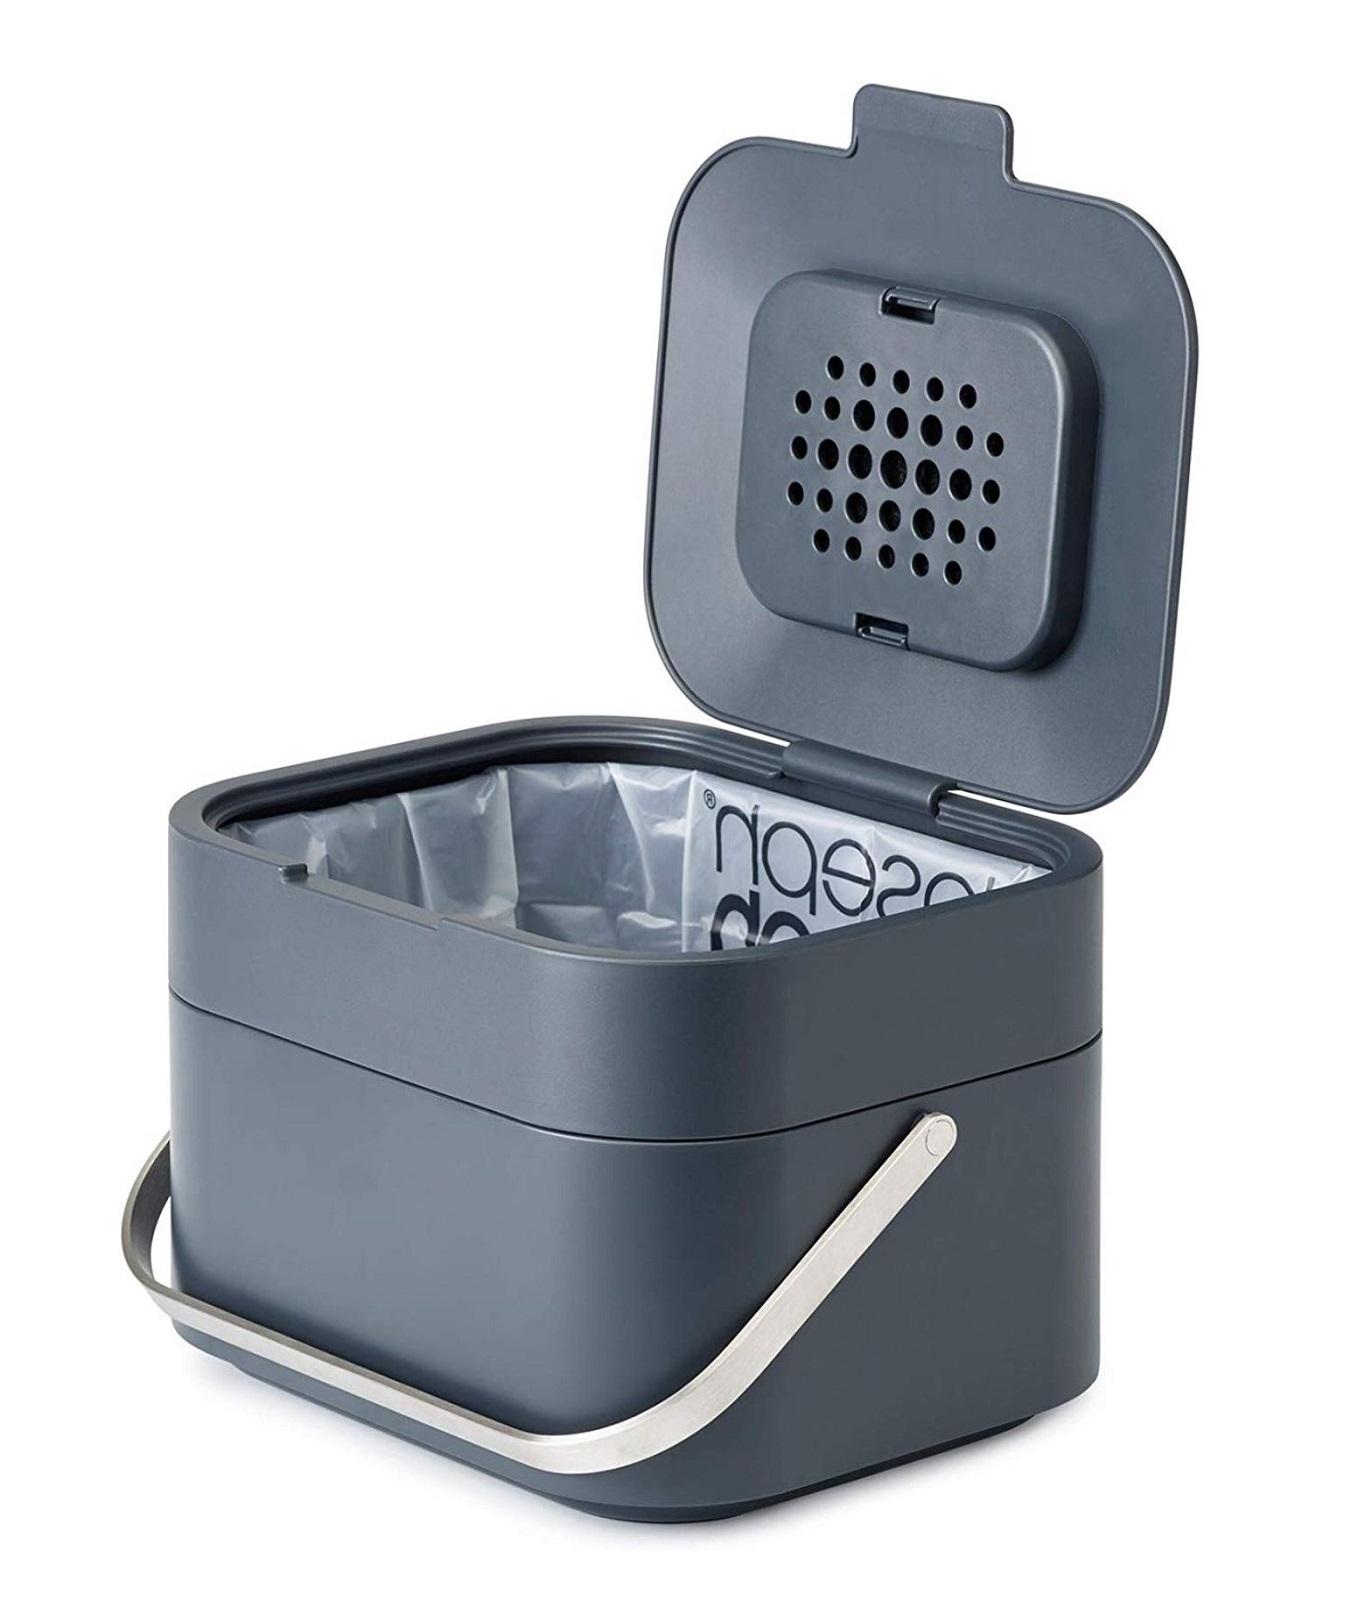 Онлайн каталог PROMENU: Контейнер для мусора Joseph Joseph STACK, объем 4 л, серый Joseph Joseph 30016